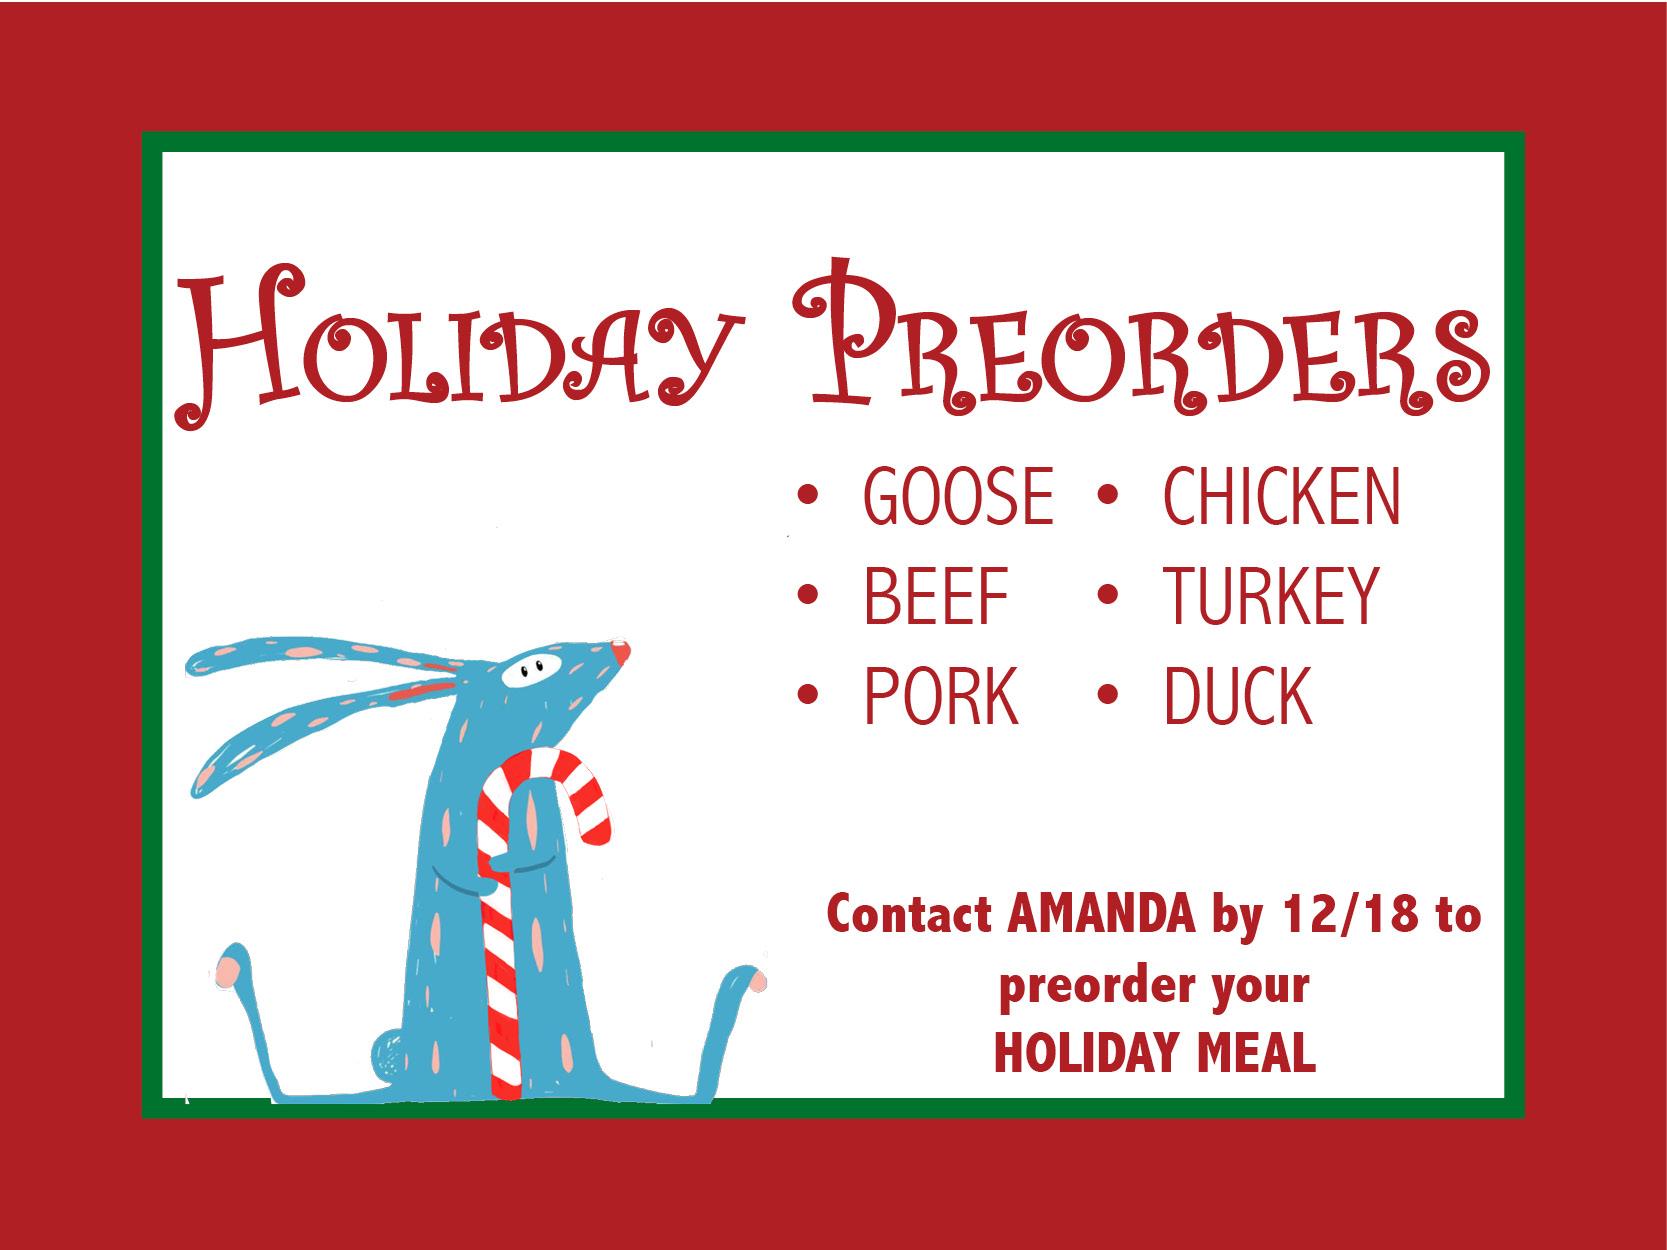 Holiday Preorder.jpg